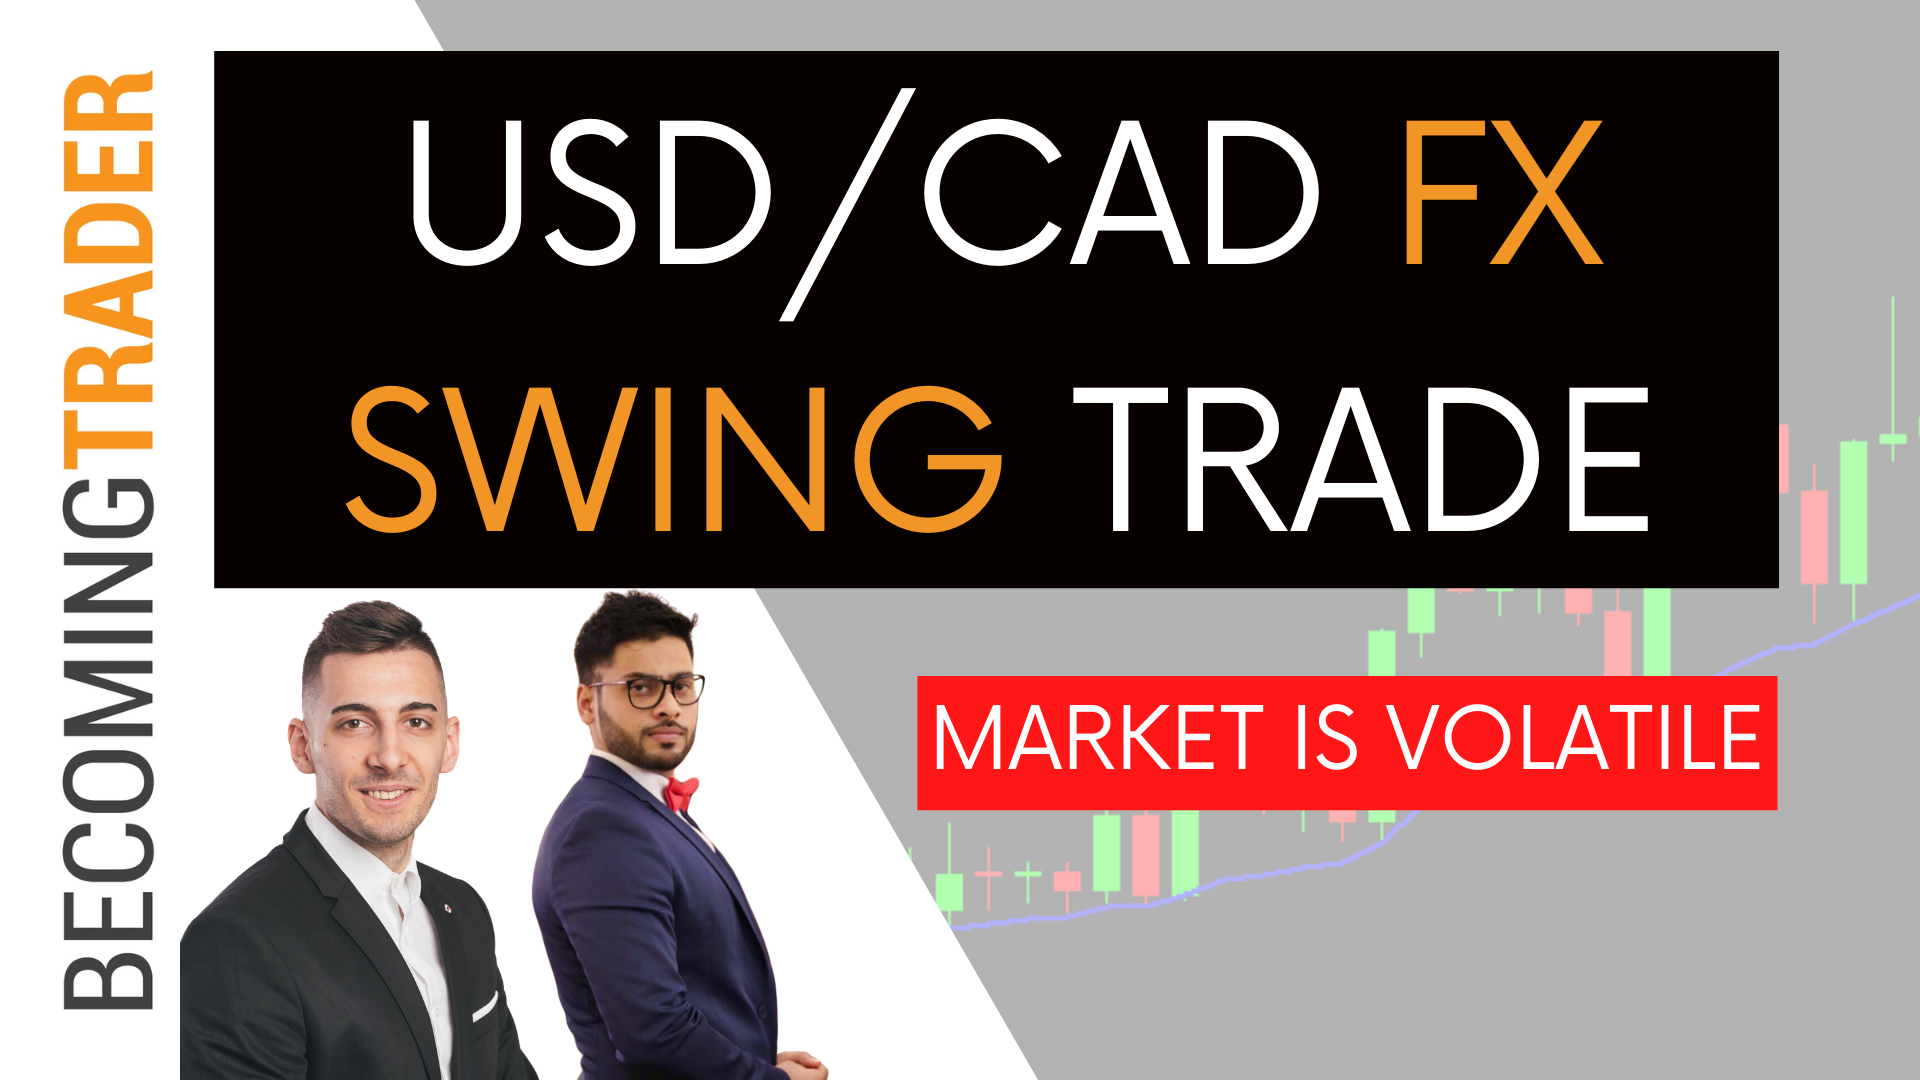 USD/CAD Forex Swing Trade | Market is Volatile